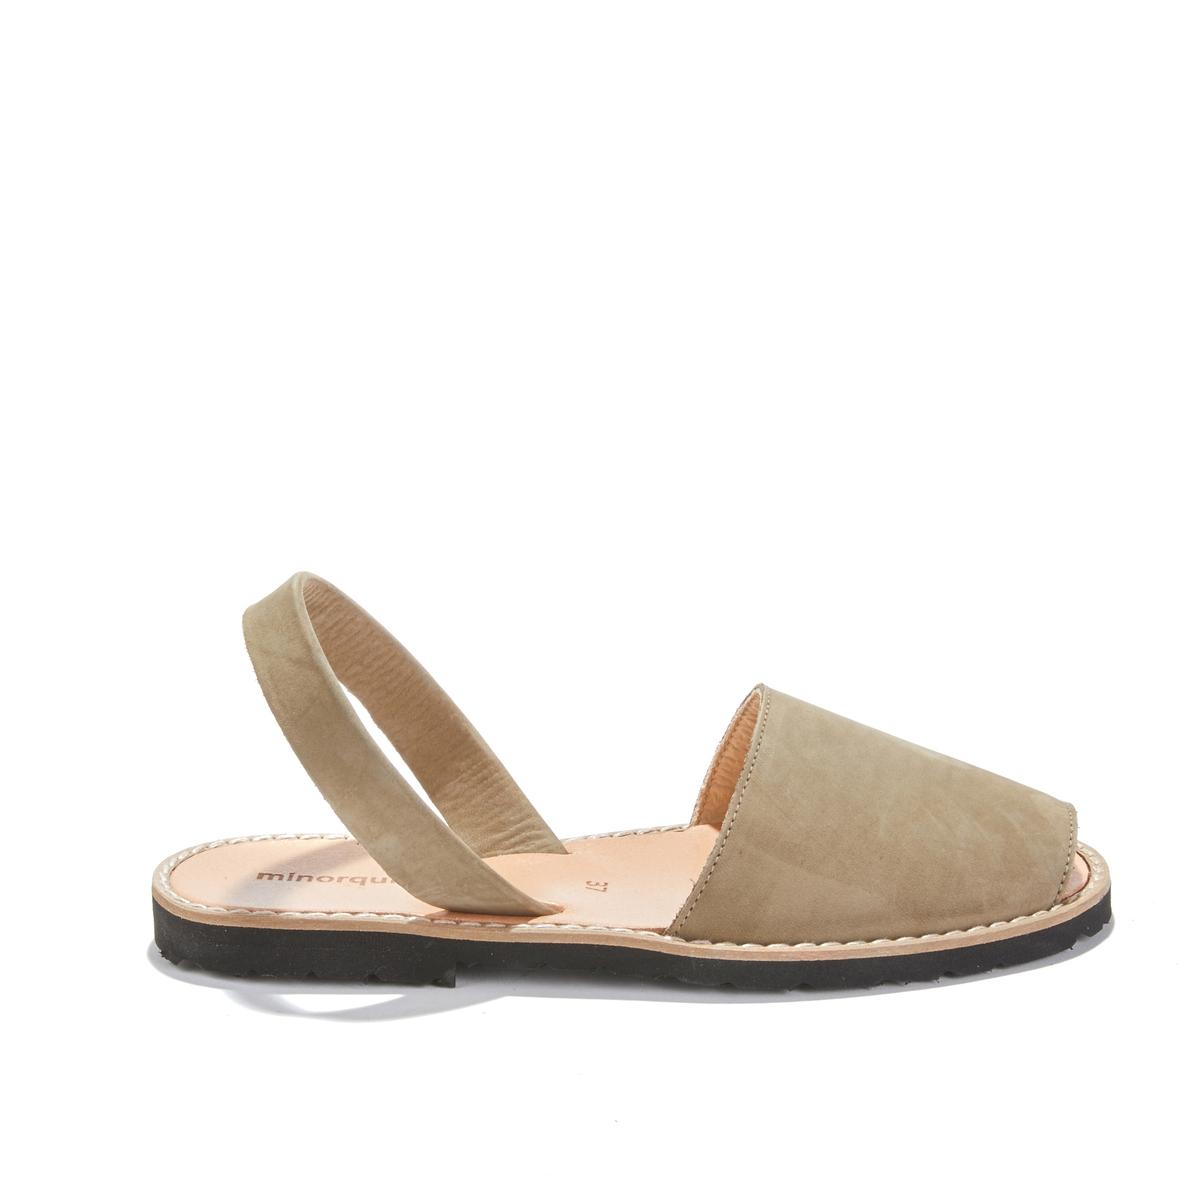 Босоножки кожаные на плоском каблуке AVARCA NUBUCK